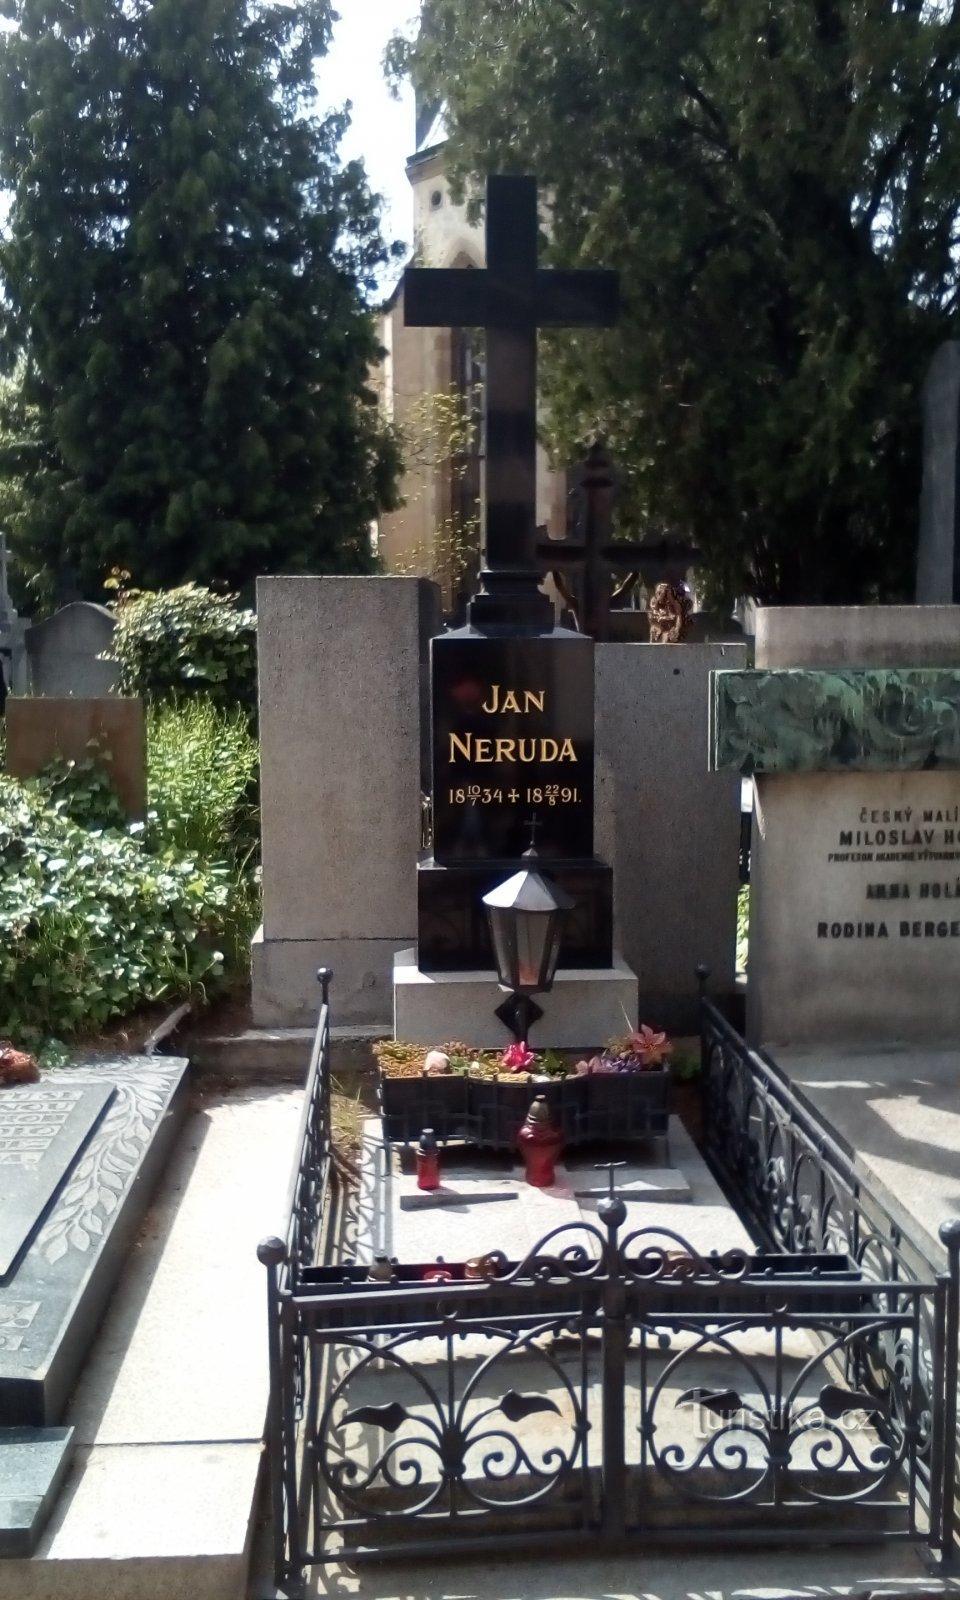 Oputn nmeck hroby - WebyShopy